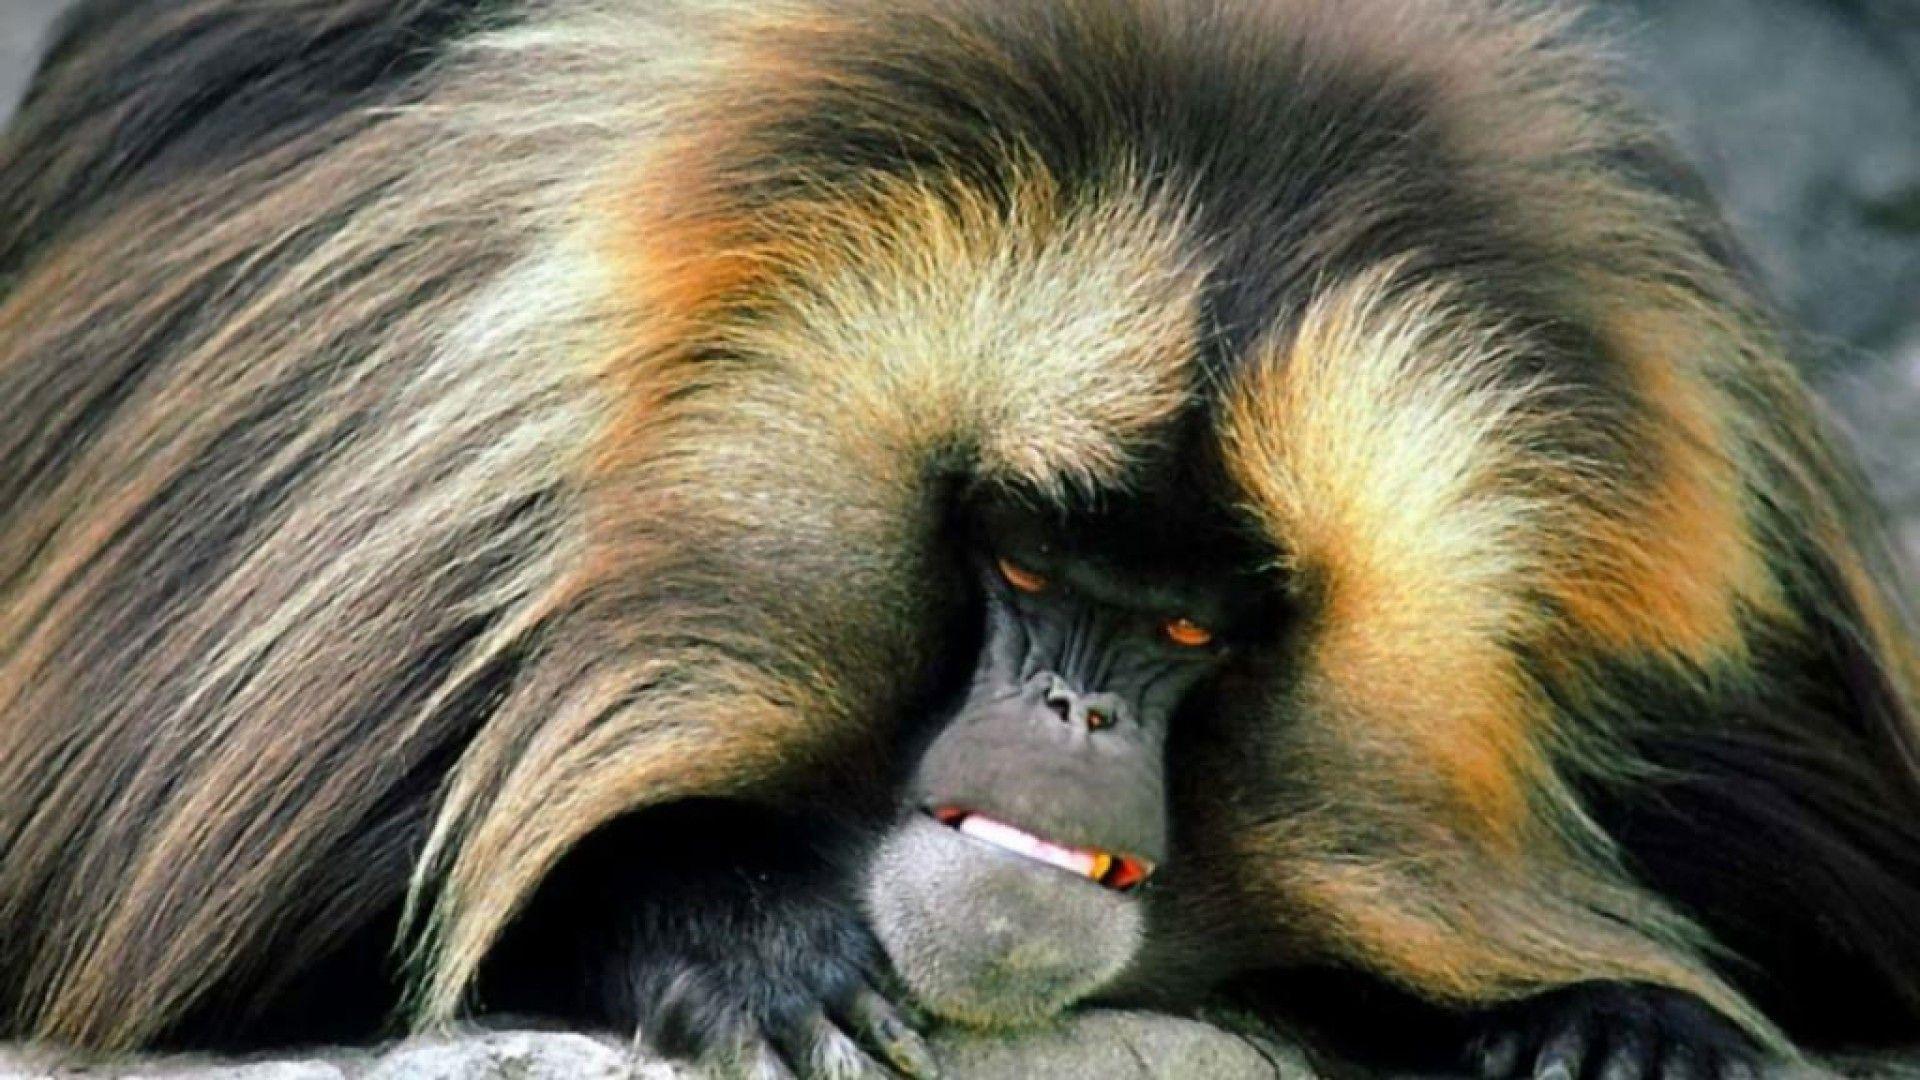 Monkey 2865 - Monkey Wallpaper